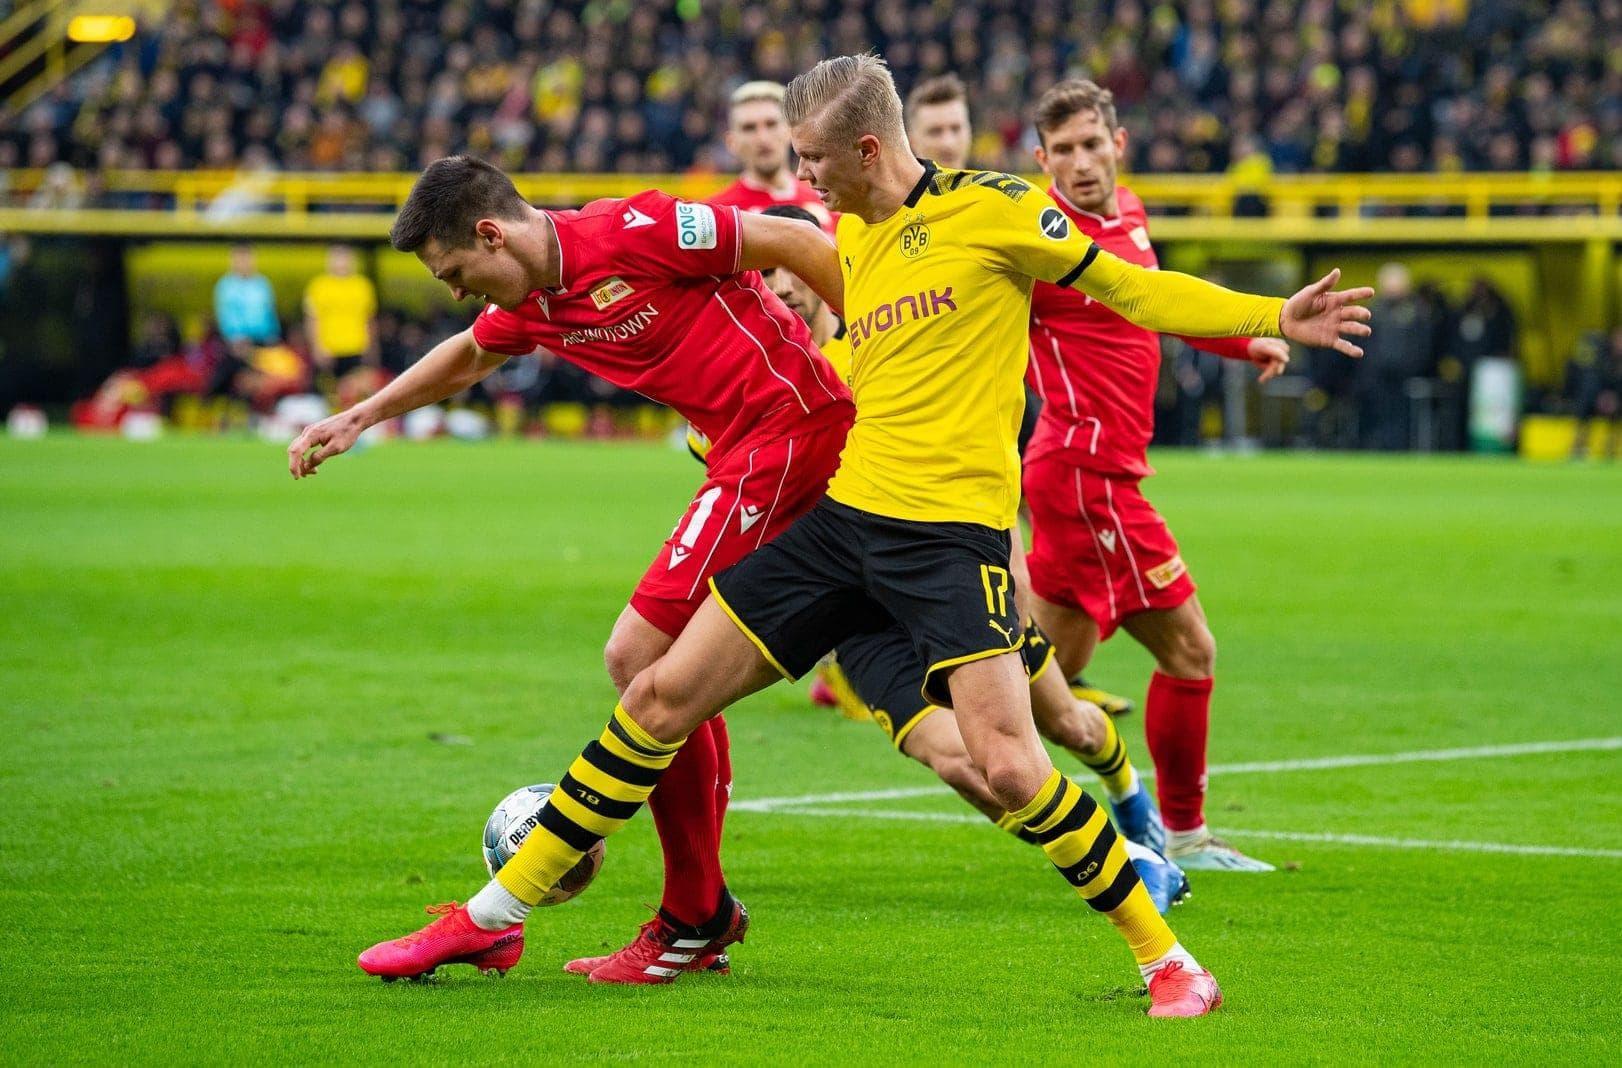 Zdf Dortmund Live